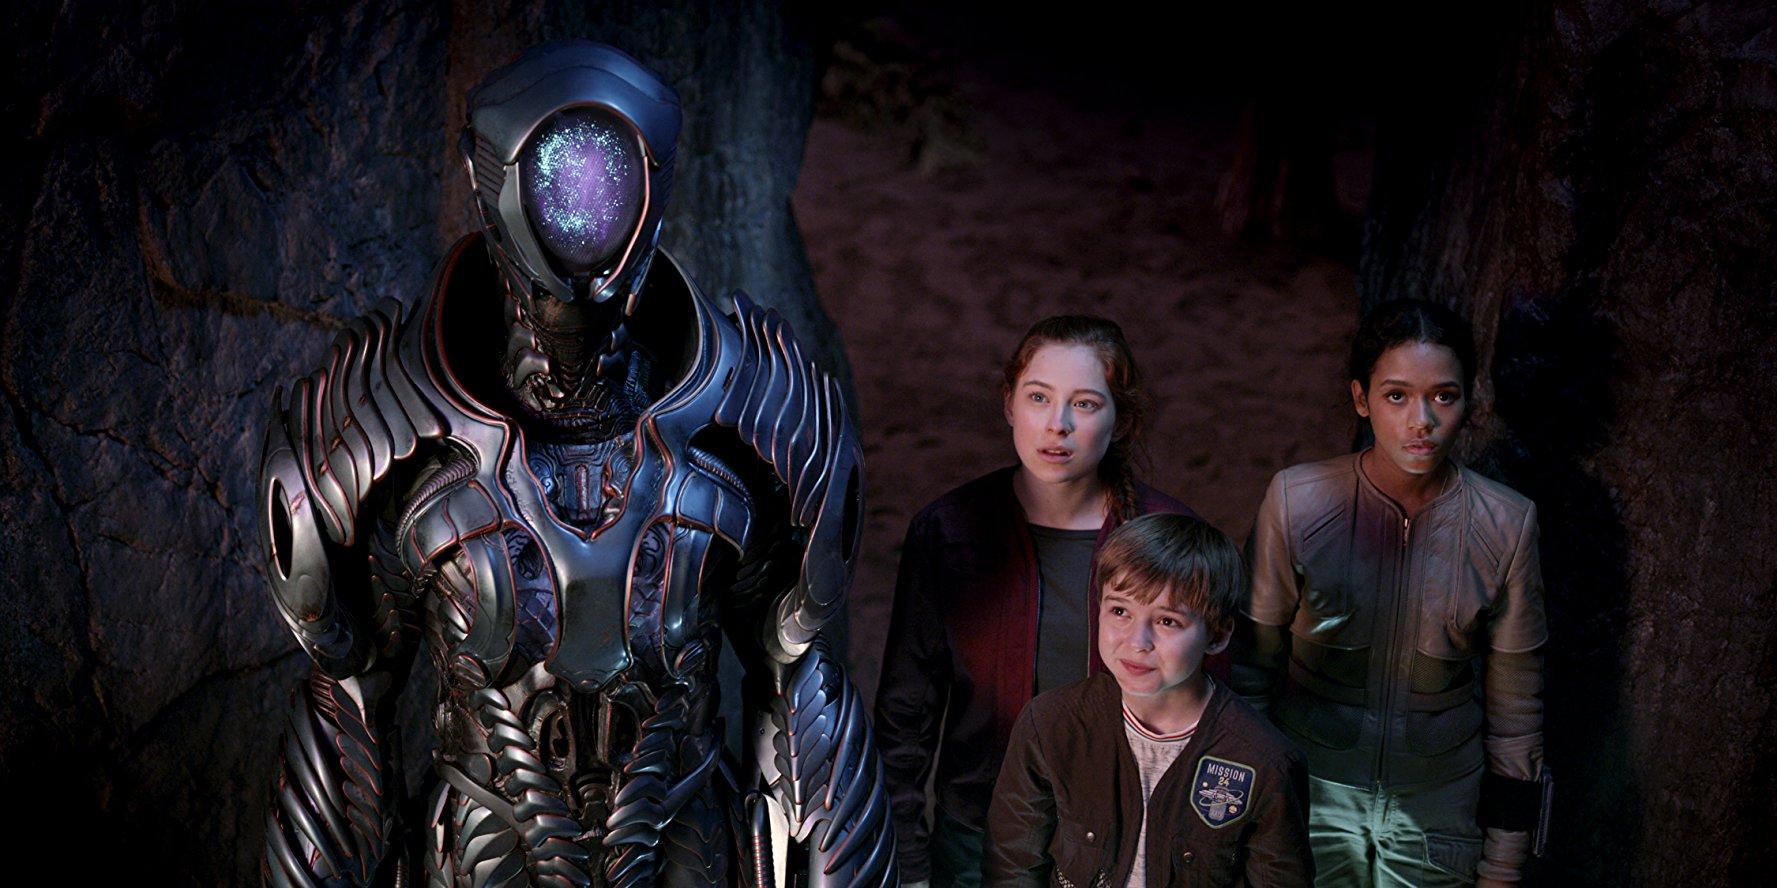 Lost In Space: série é renovada para a 3ª e última temporada